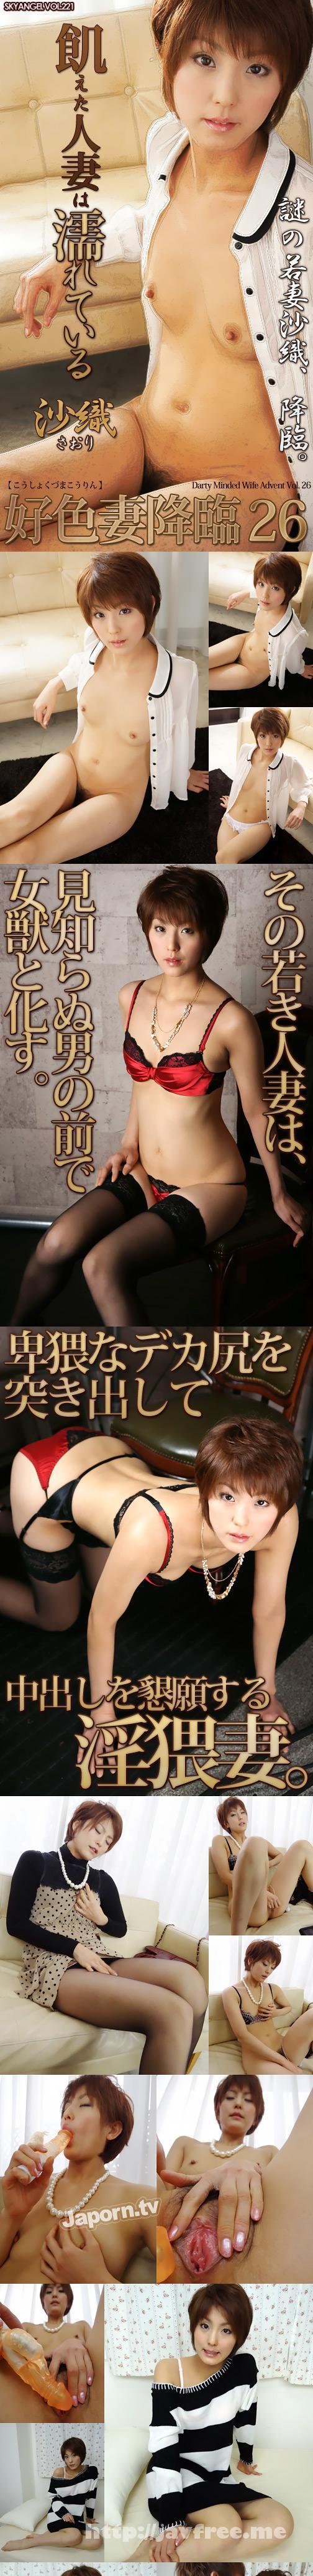 [SKY 221] 好色妻降臨 Vol.26 : 沙織 沙織 SKY Saori